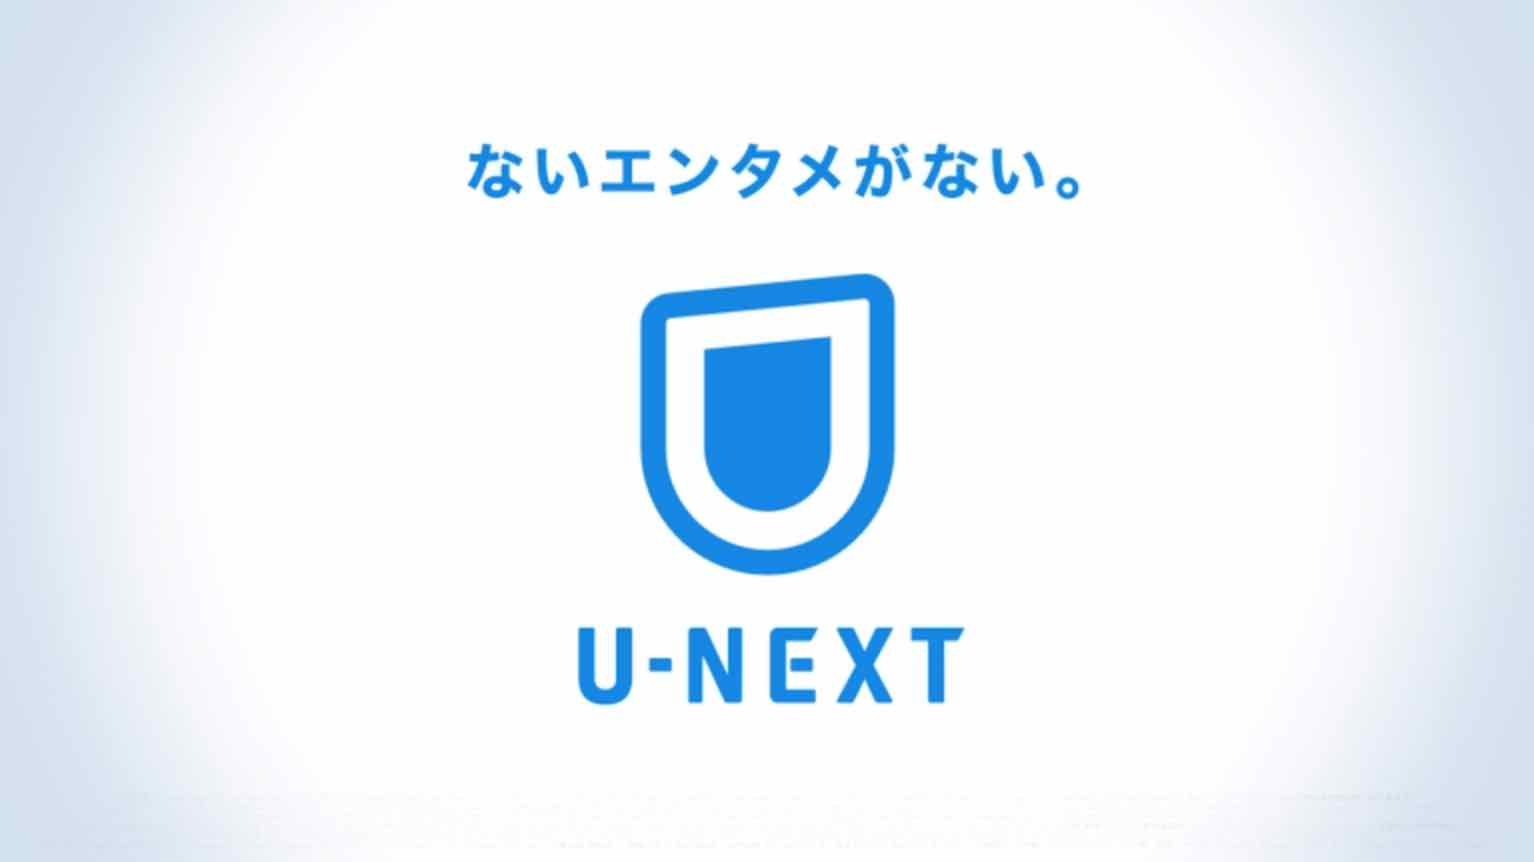 U-NEXTを利用した感想!メリットとデメリットを本音で語る!